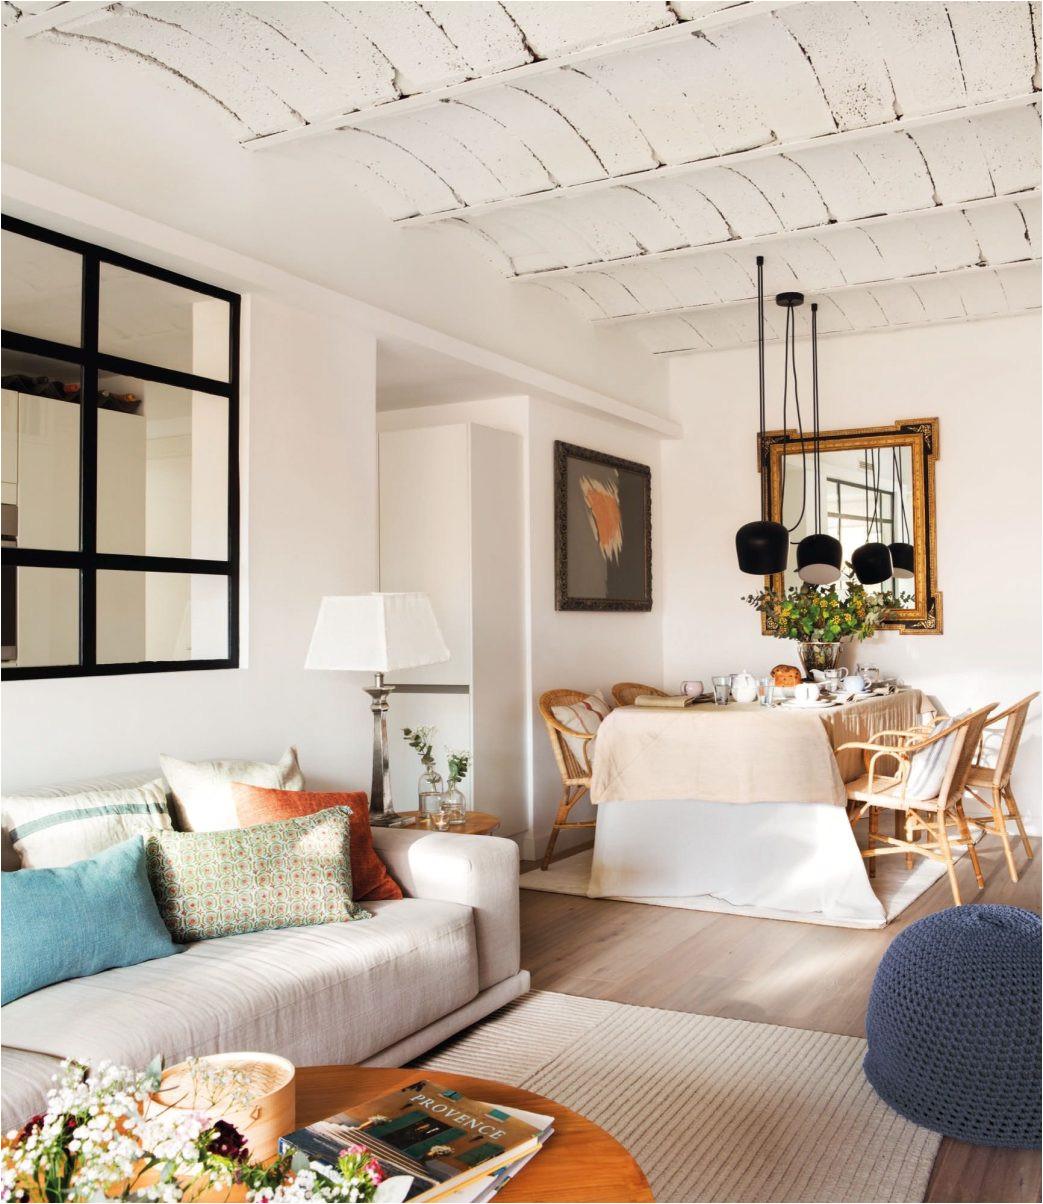 best decoracion interiores salones clasicos modernos salon moderno pequenos rusticos grandes nunca sesenta metros dieron para tanto with decoracion de